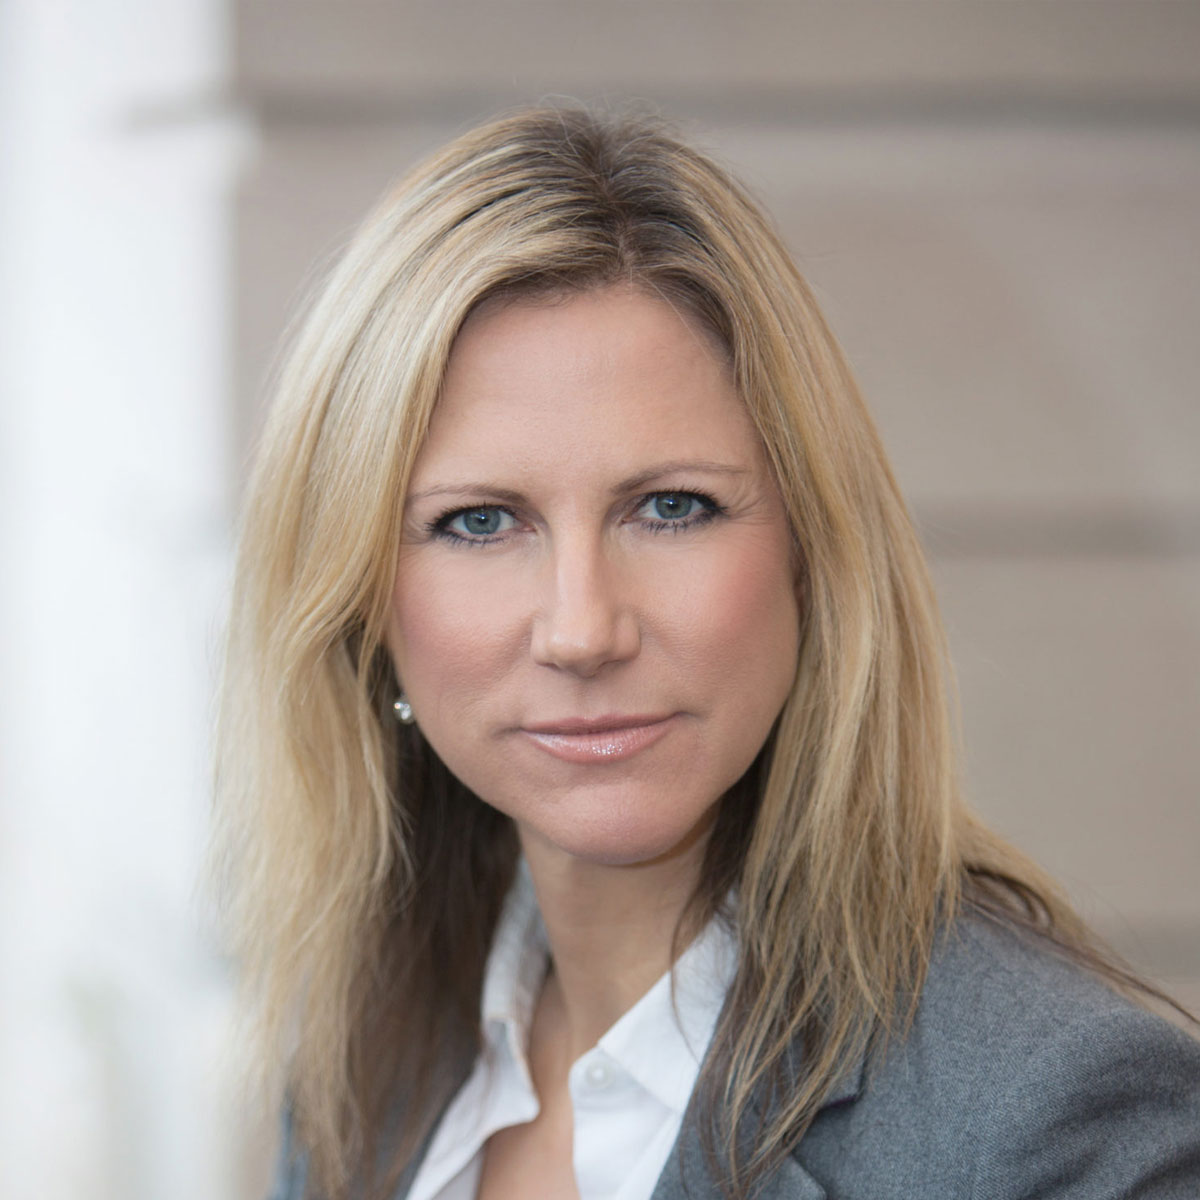 Natalie Wharton